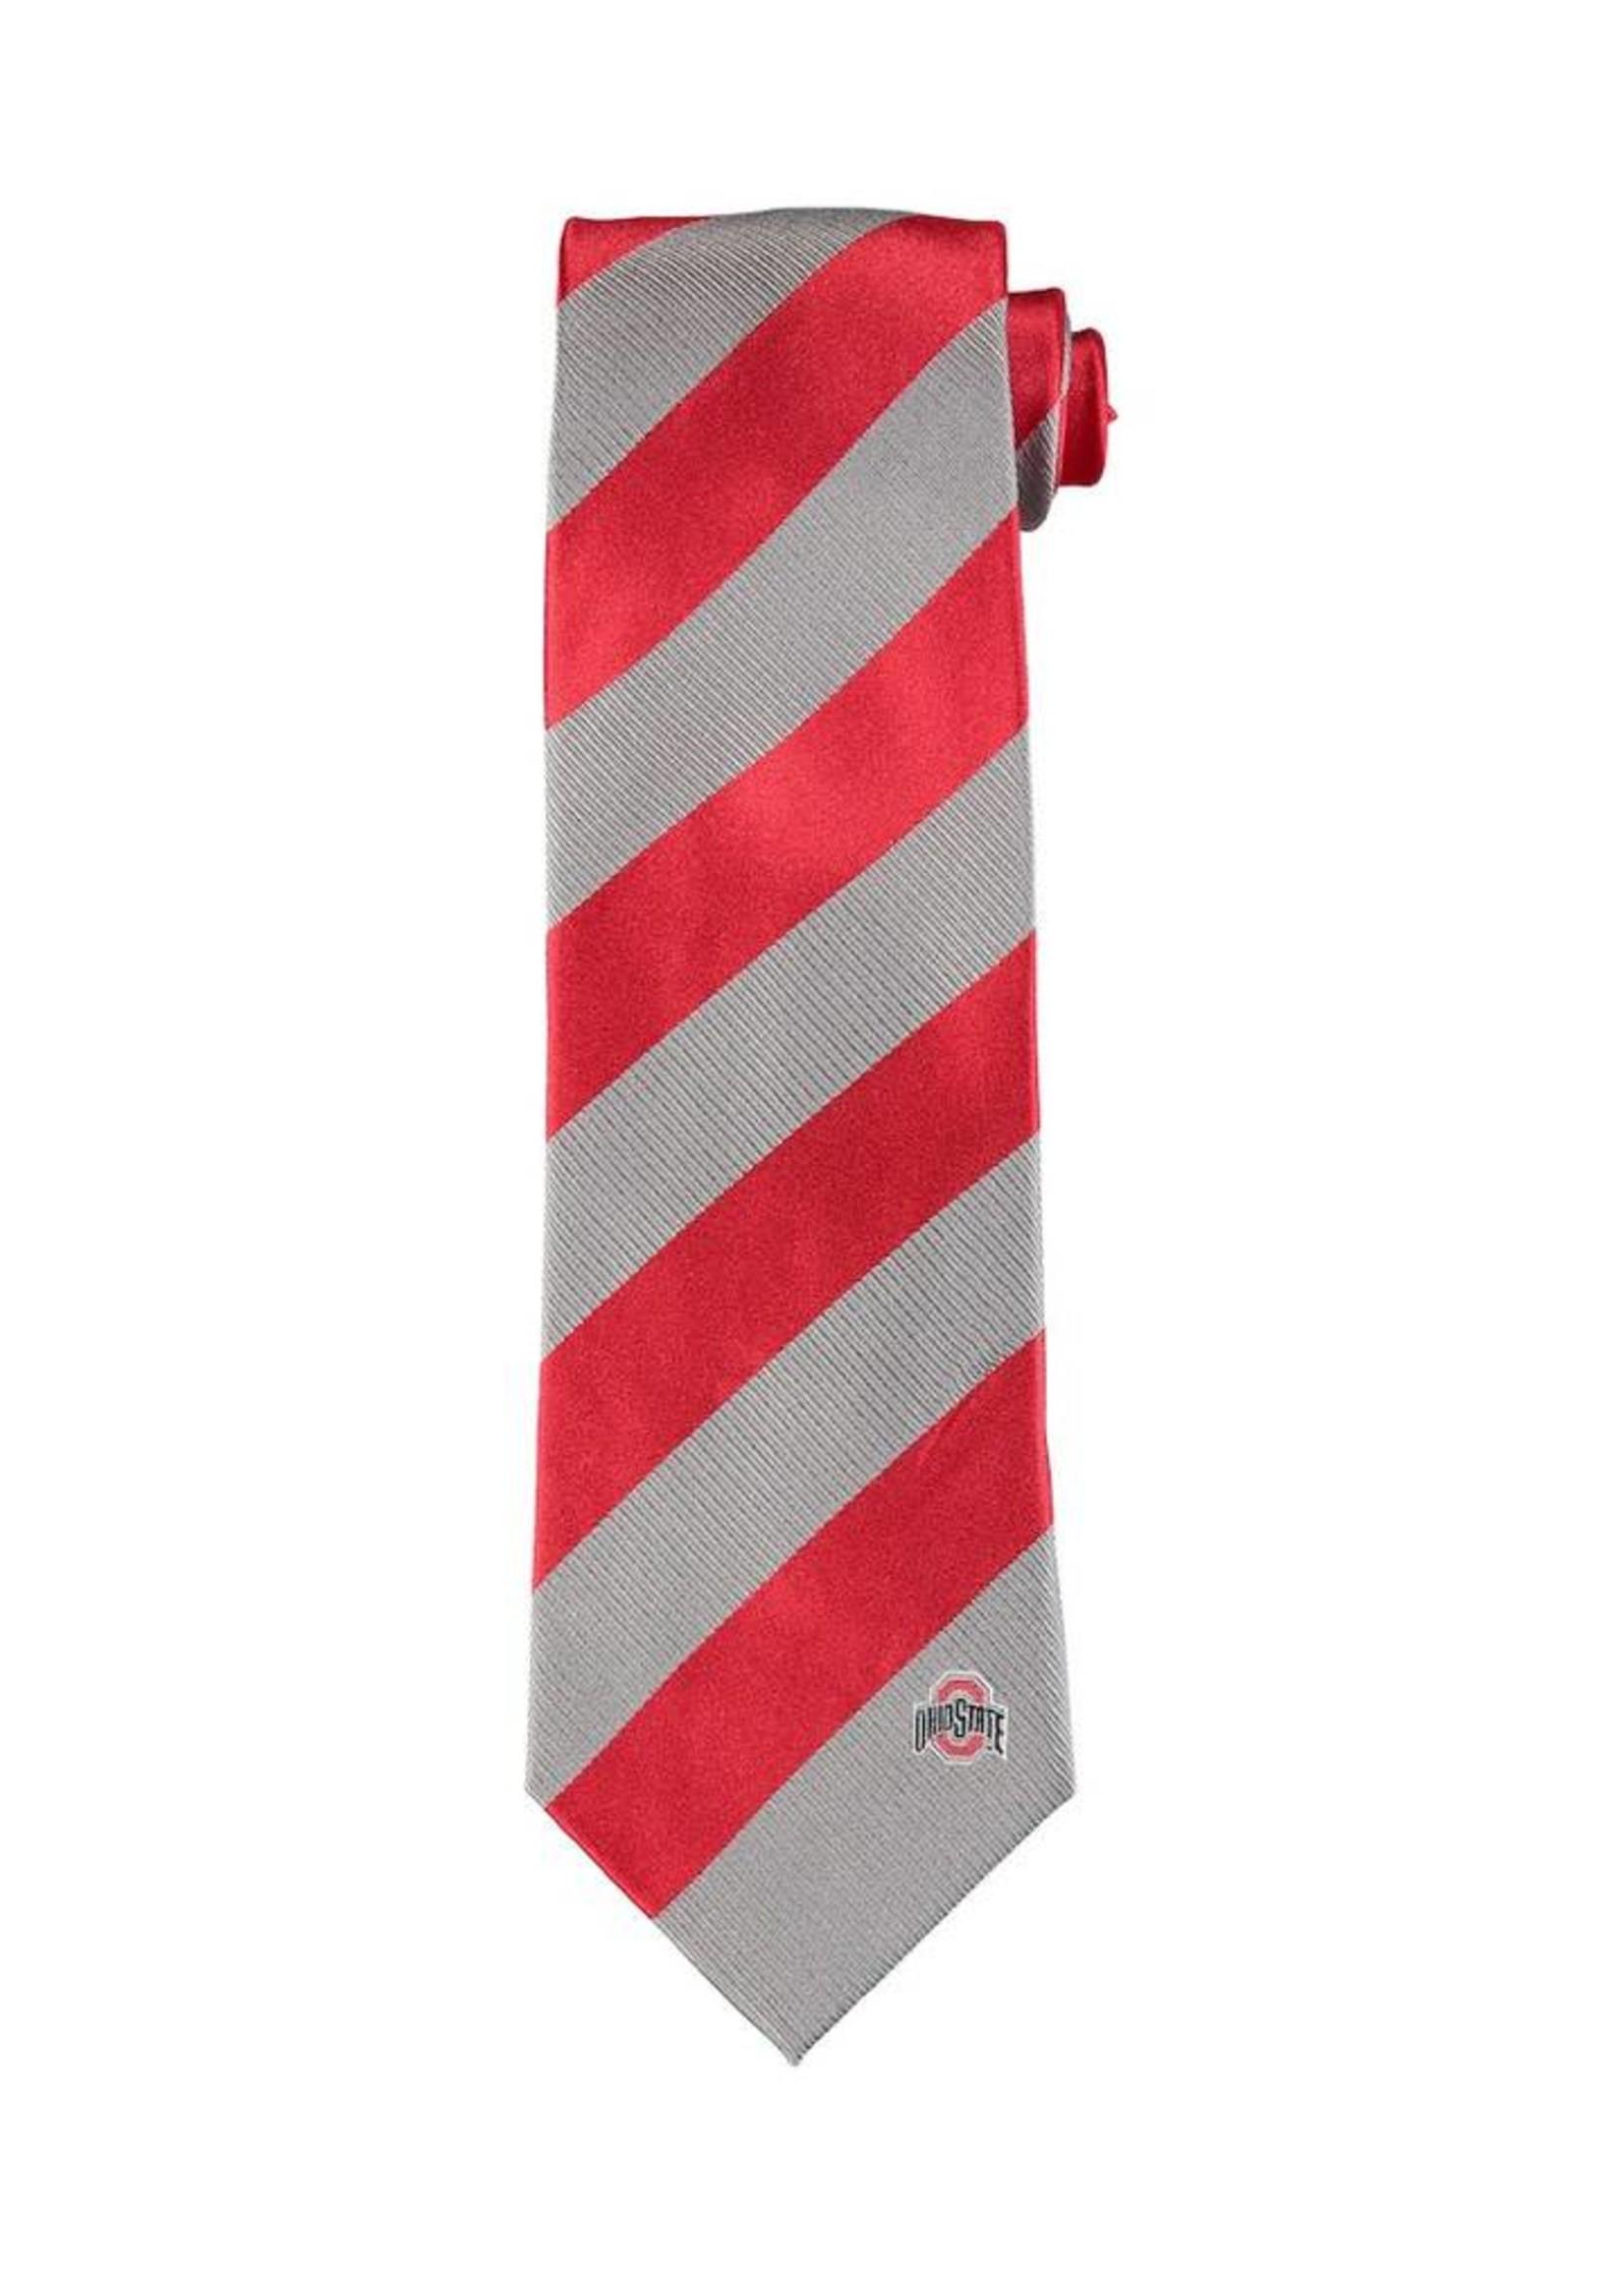 Ohio State Buckeyes Regiment Woven Silk Tie